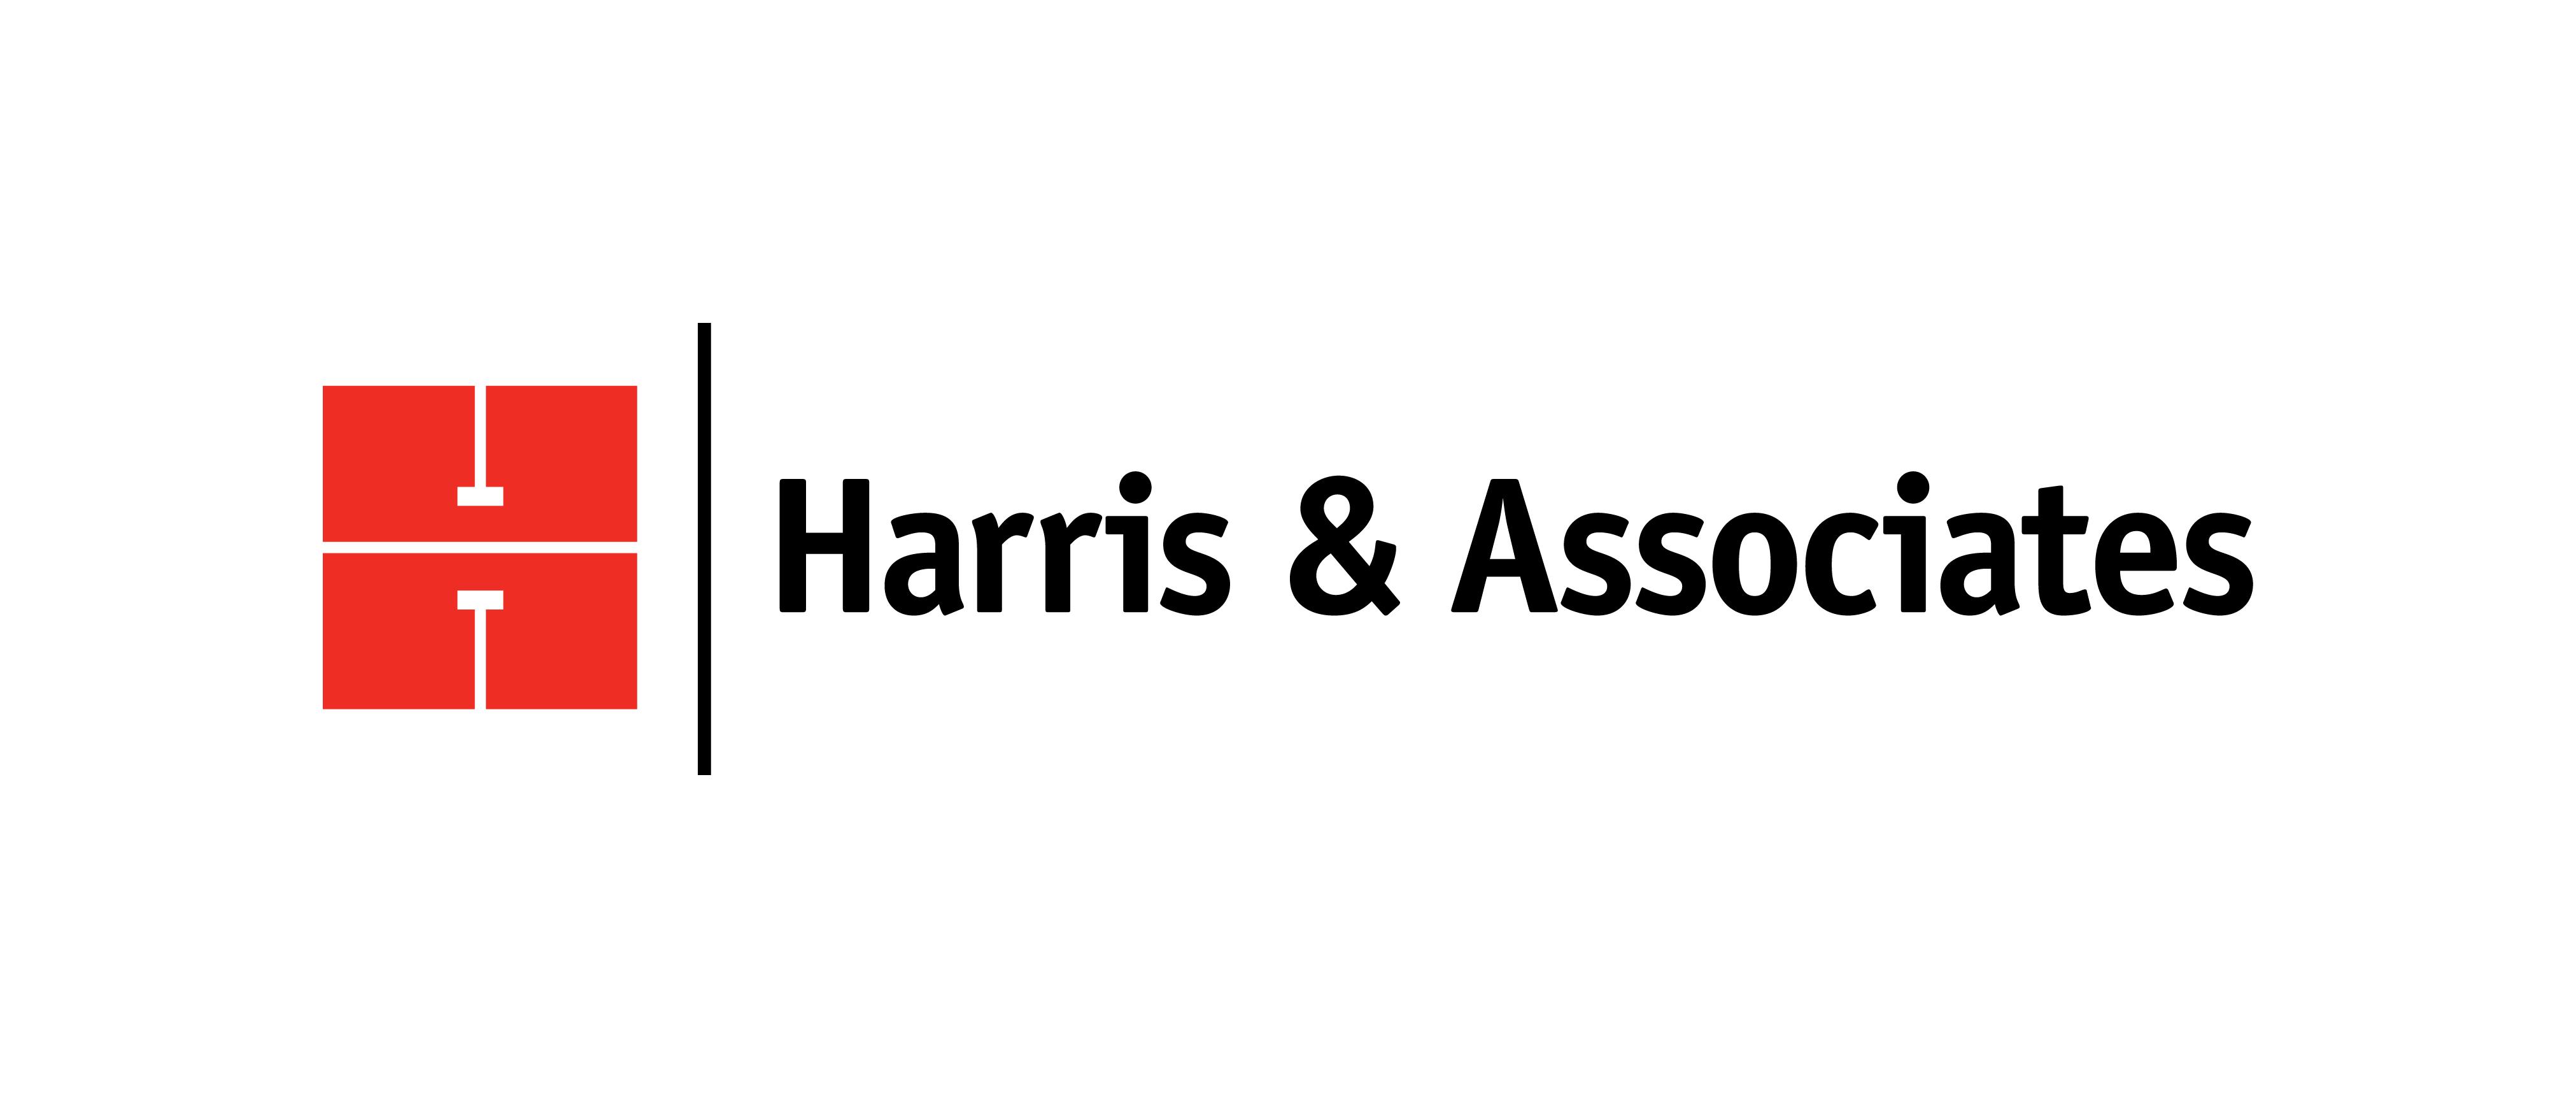 Harris & Associates logo